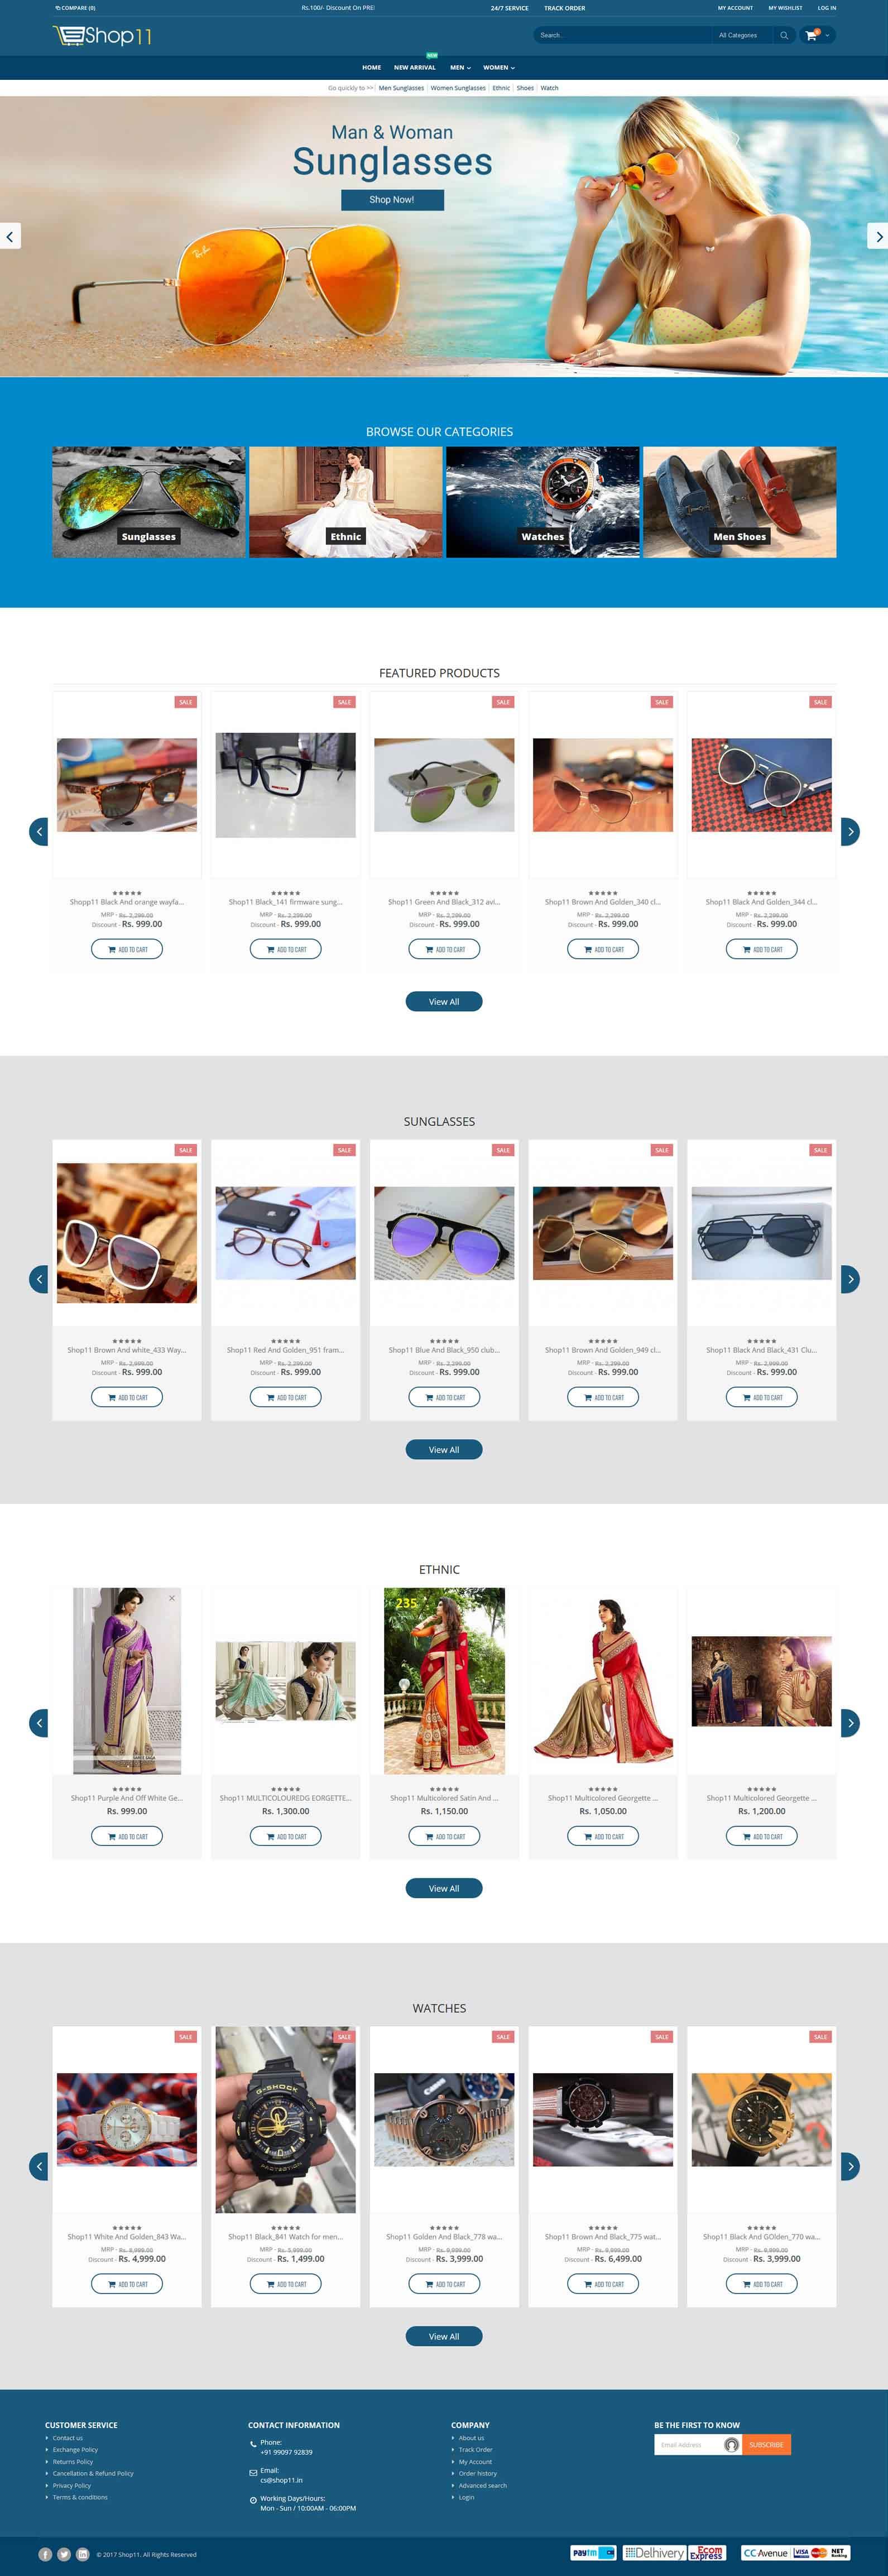 Shop11.in Online Shoping